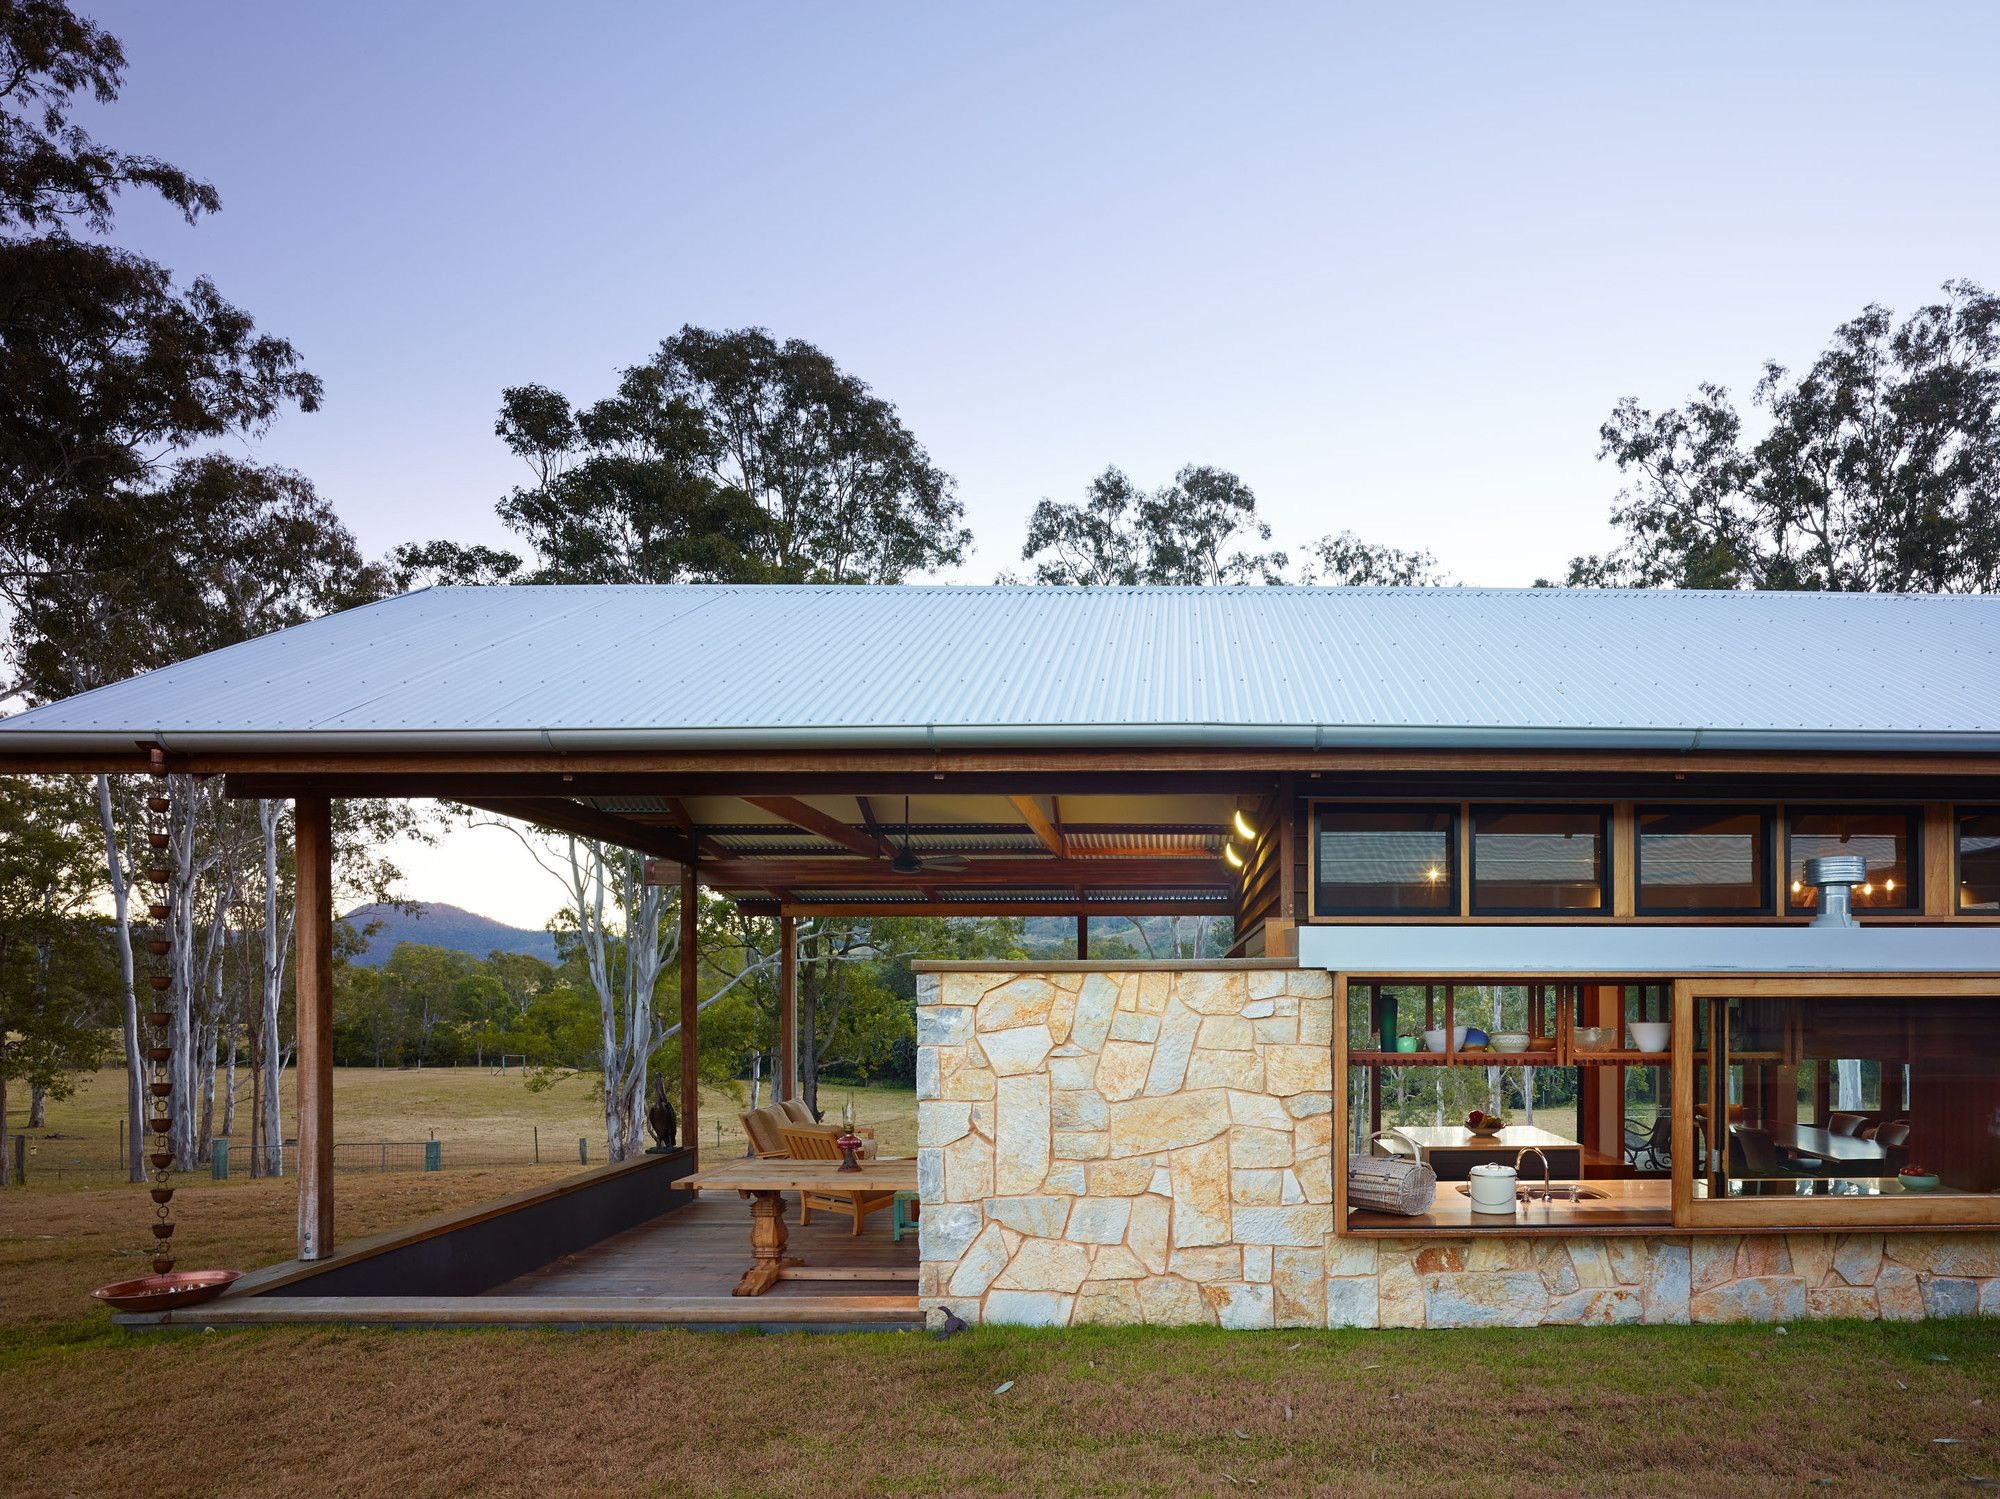 Hinterland House Shaun Lockyer Architects - 5